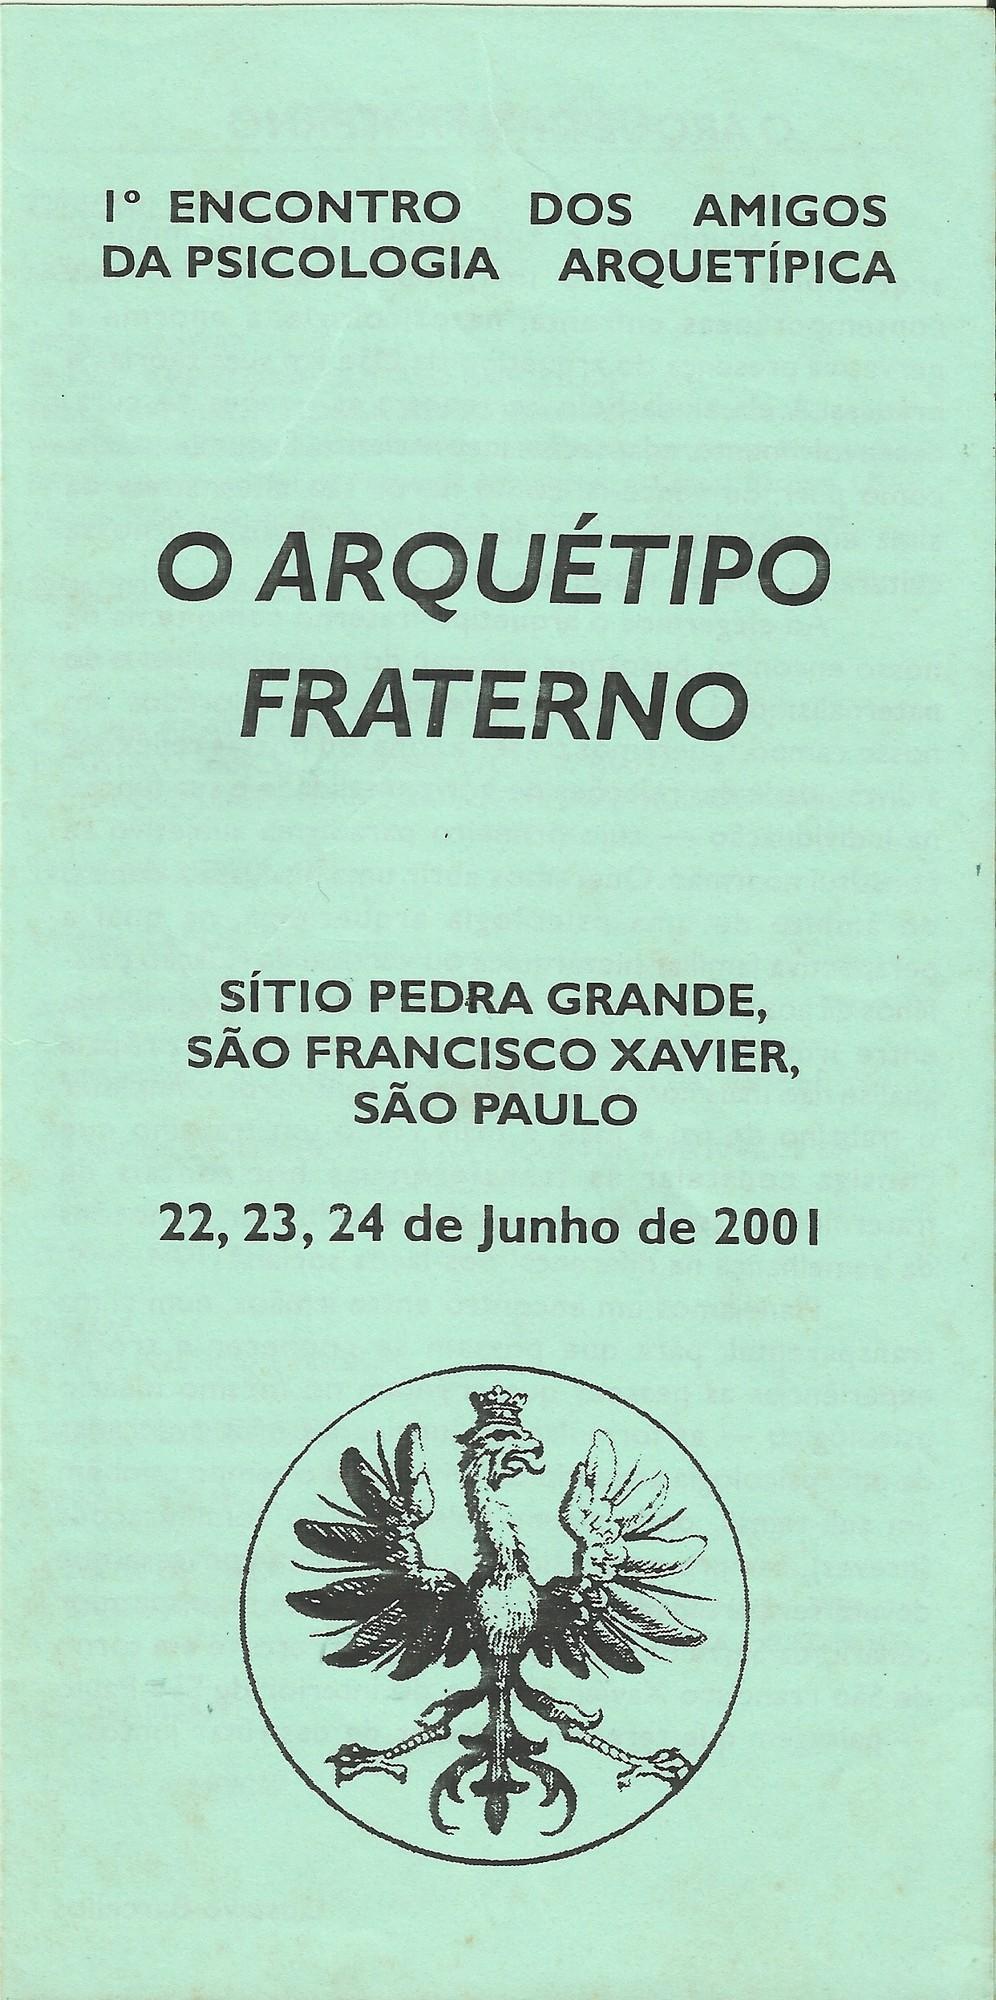 ENCONTRO 2001